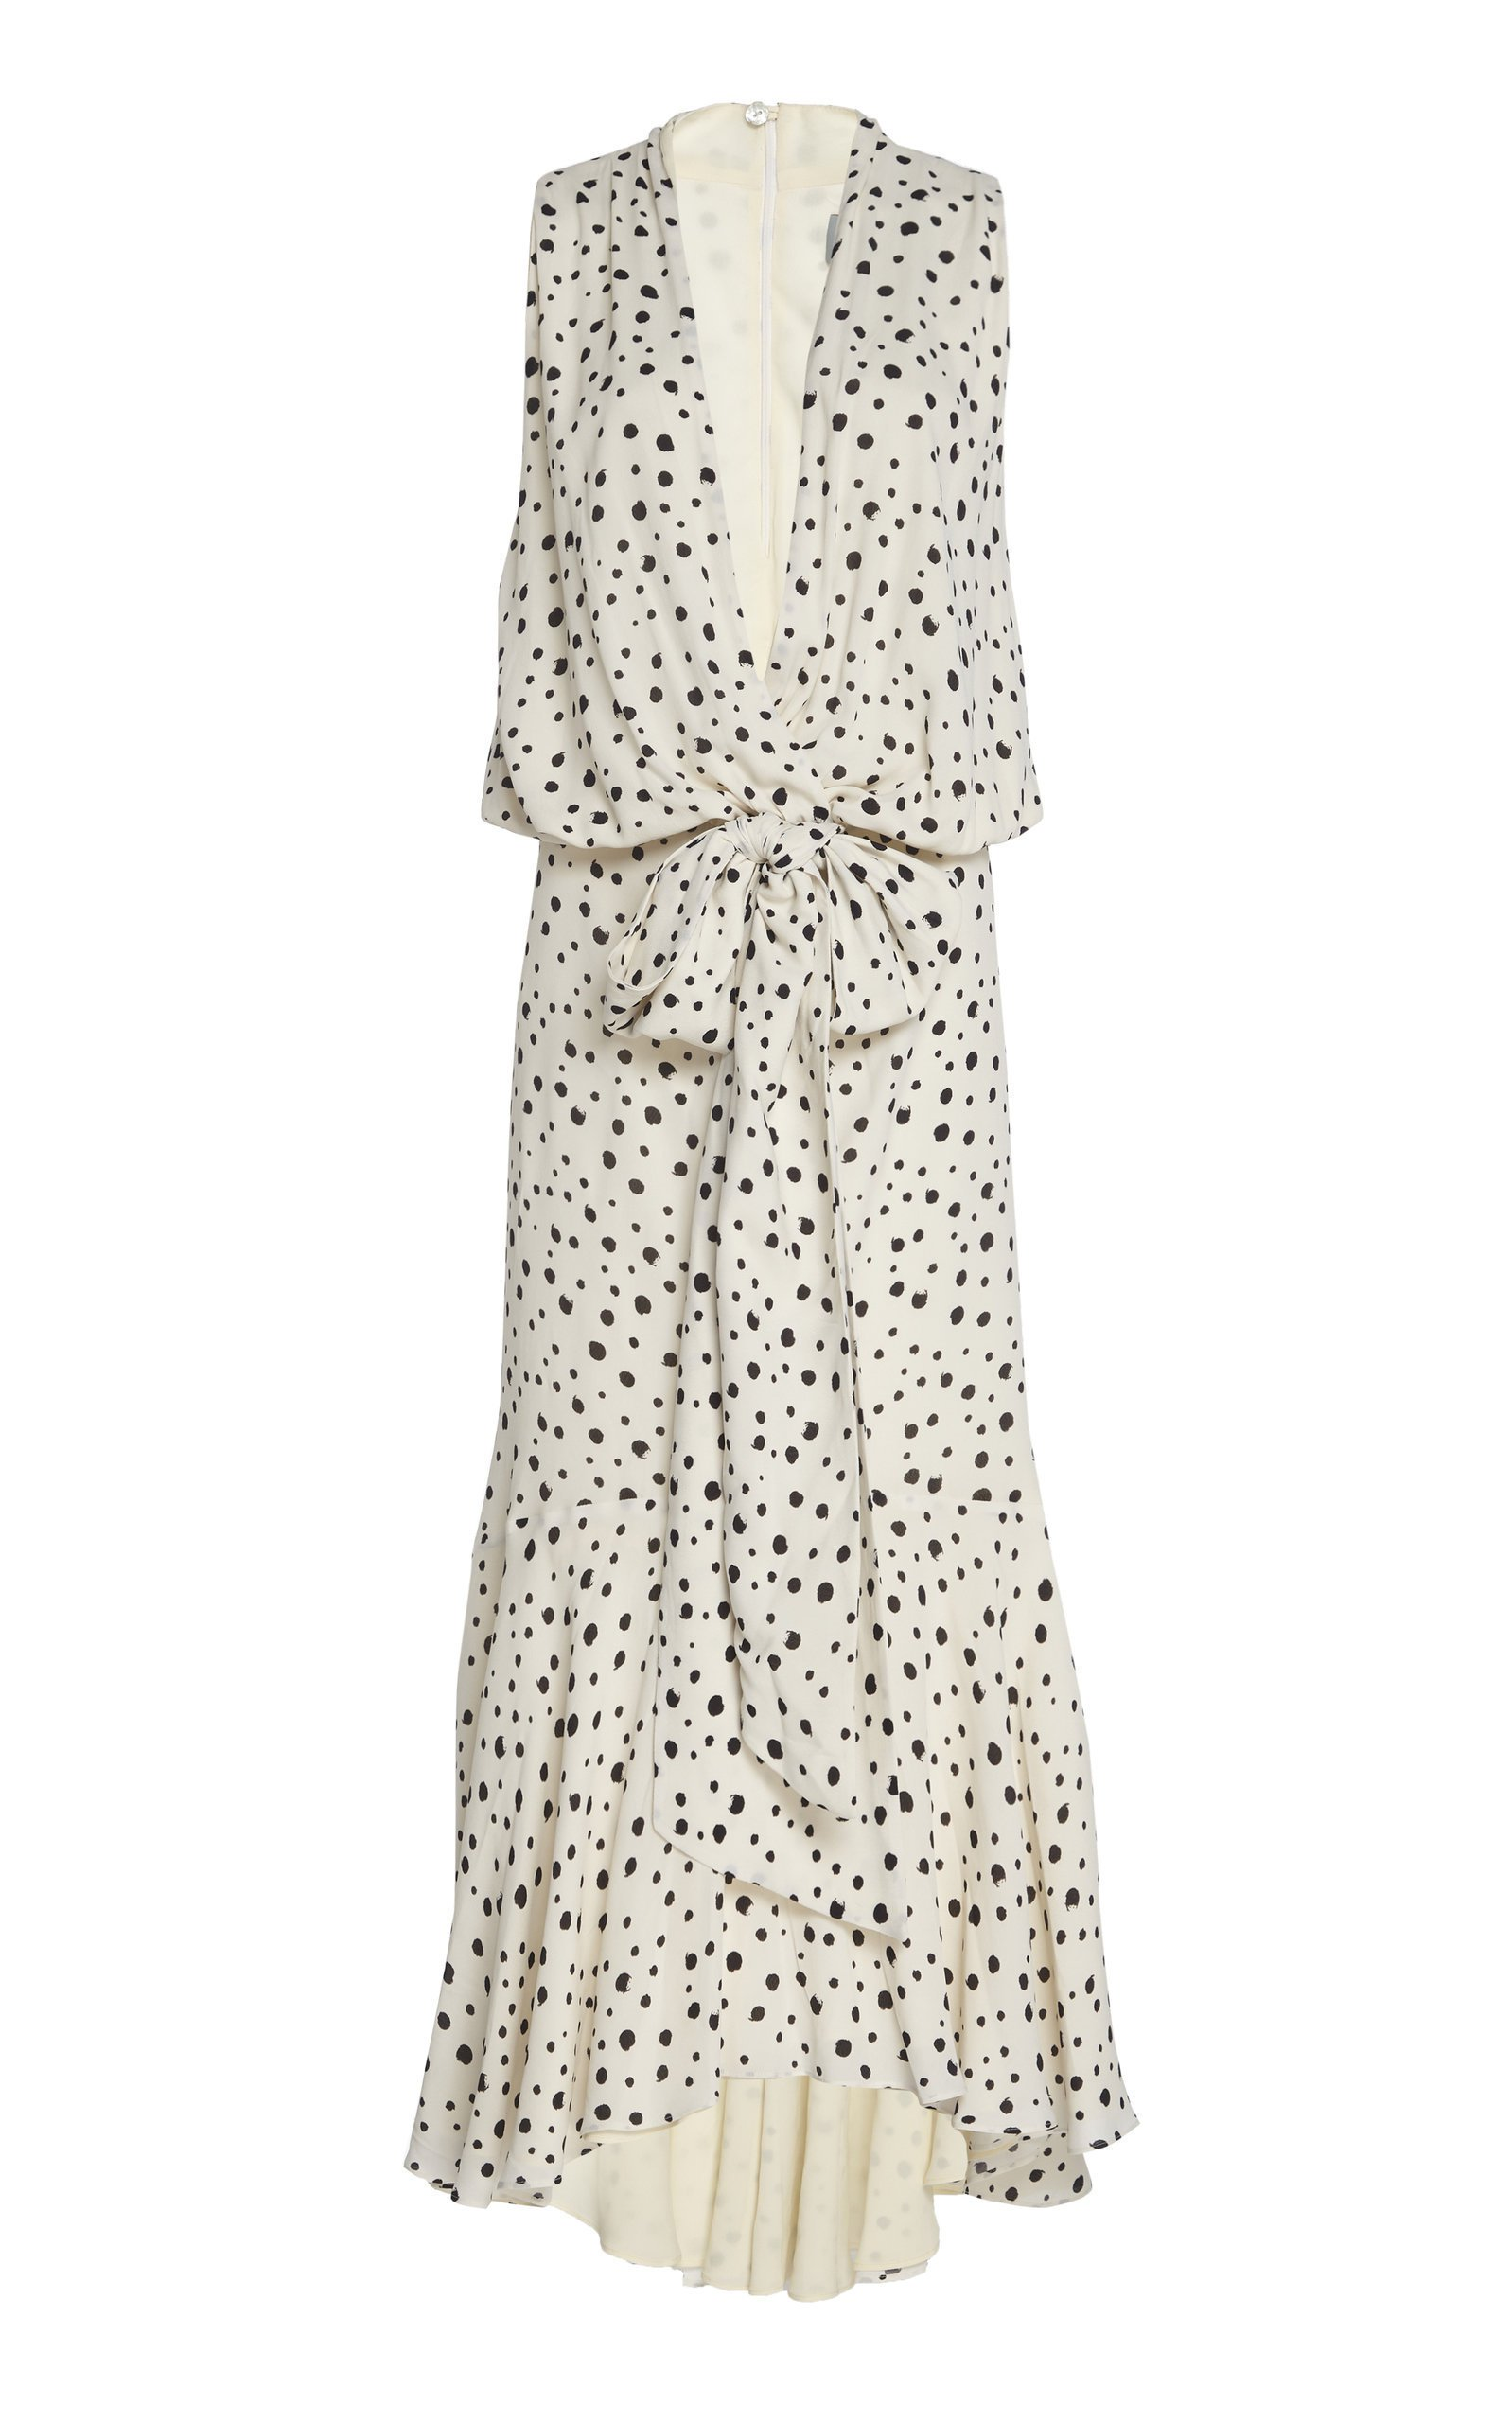 Silvia Tcherassi Nini Crepe De Chine Dress Size: L